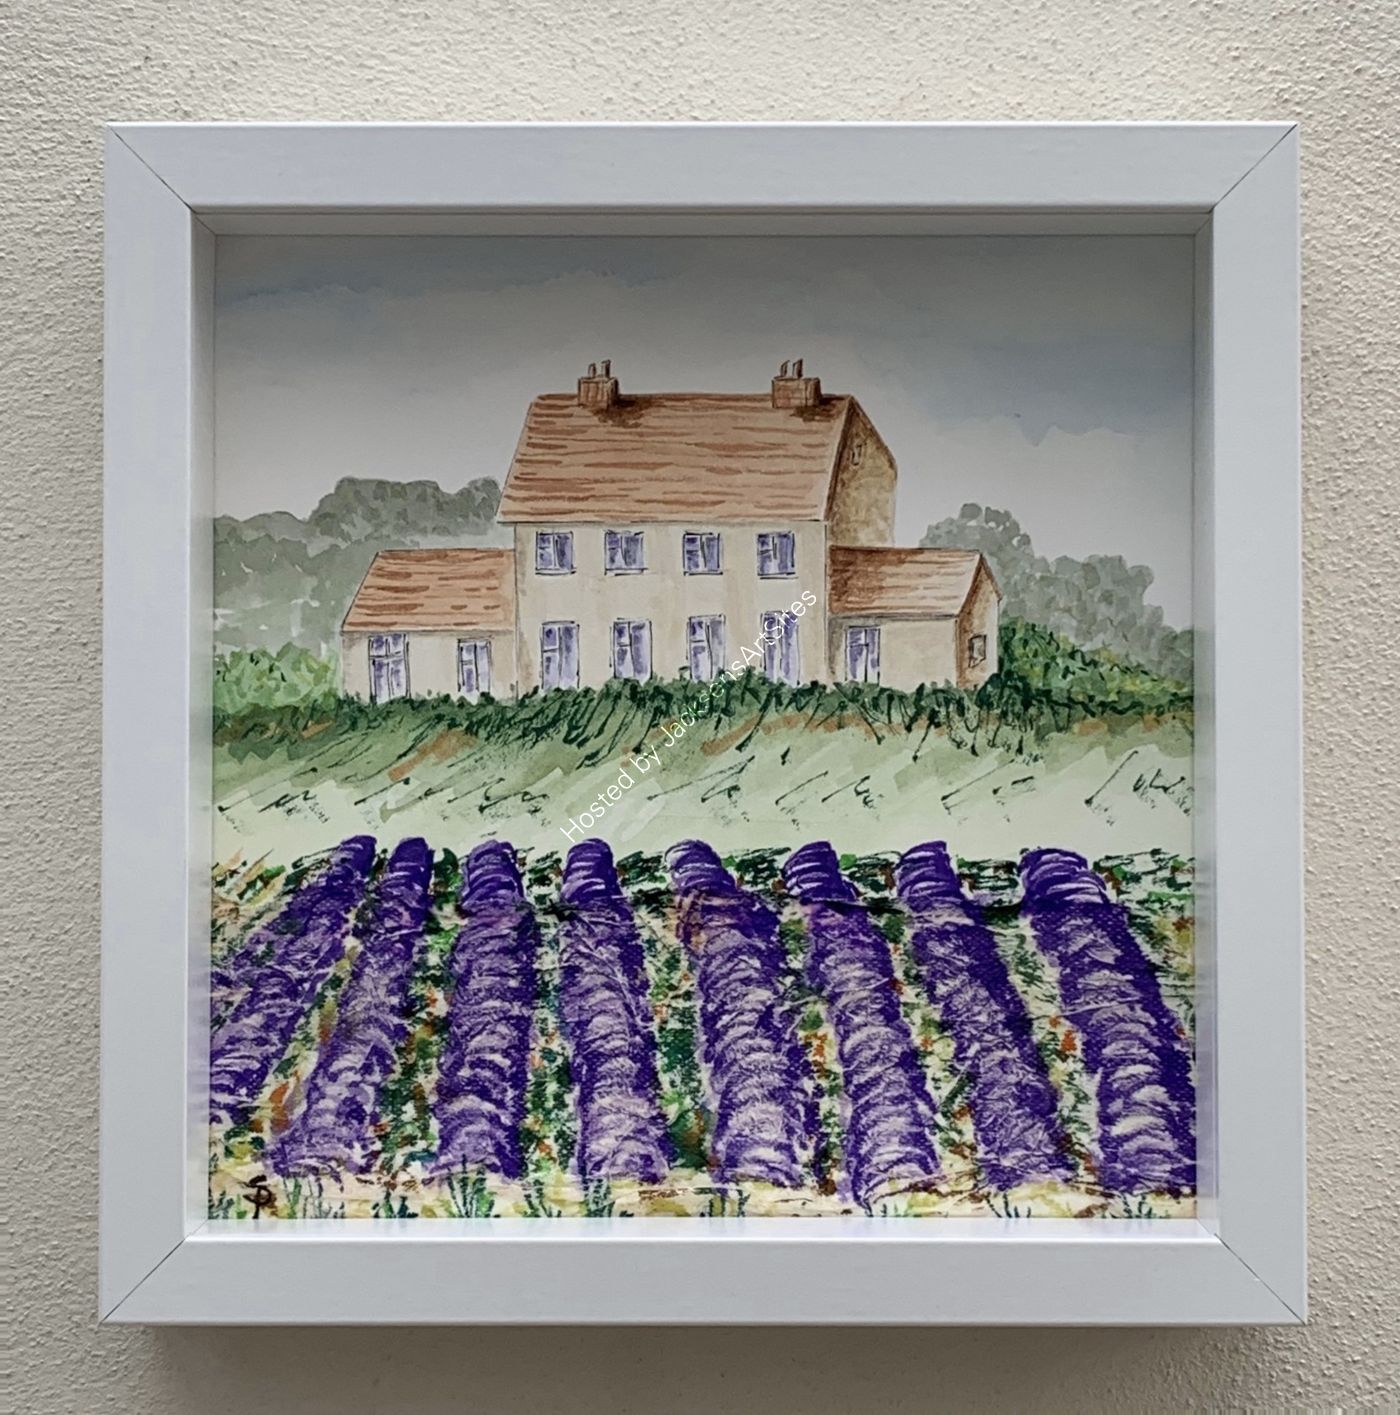 'Snowshill Farm' Lavender Fields Framed